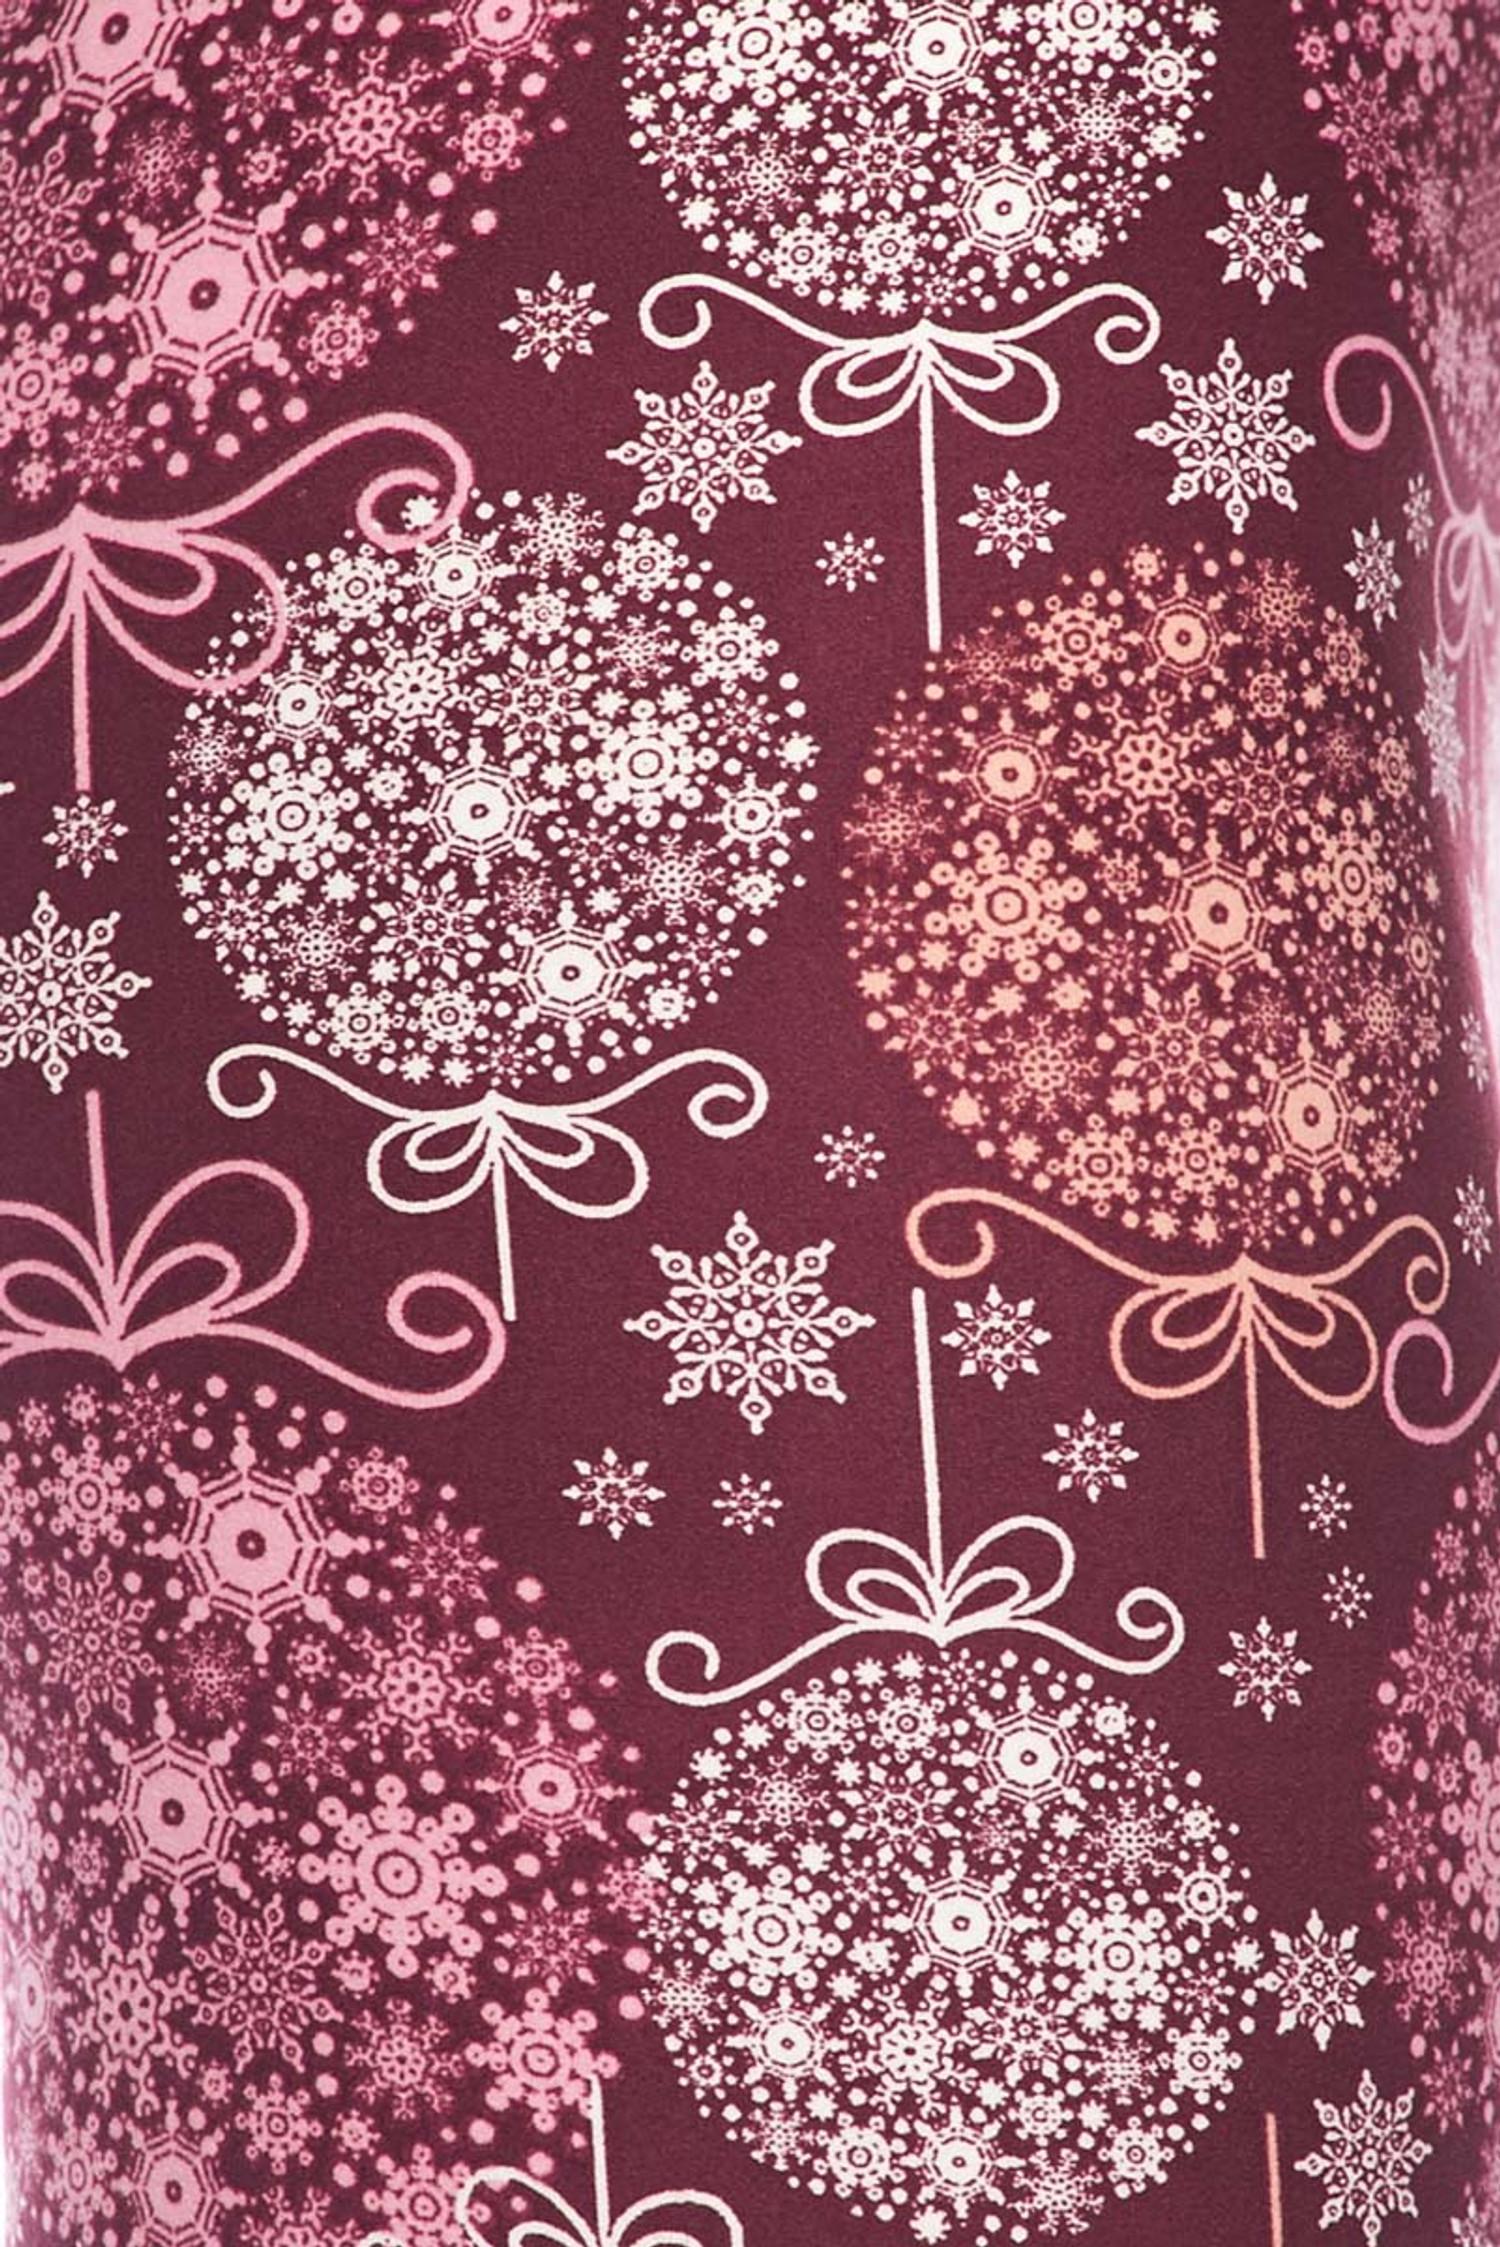 Brushed Pink Snowflake Ornaments Leggings